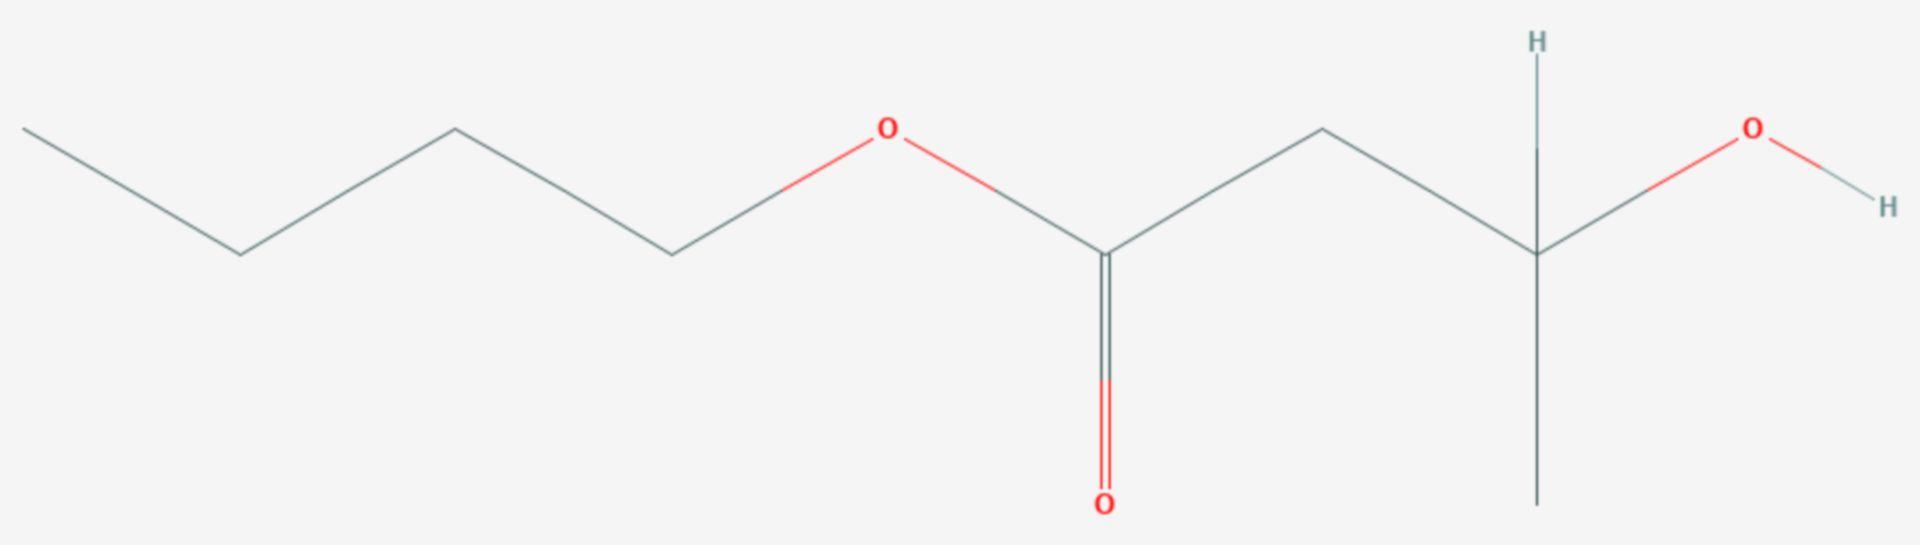 3-Hydroxybuttersäurebutylester (Strukturformel)